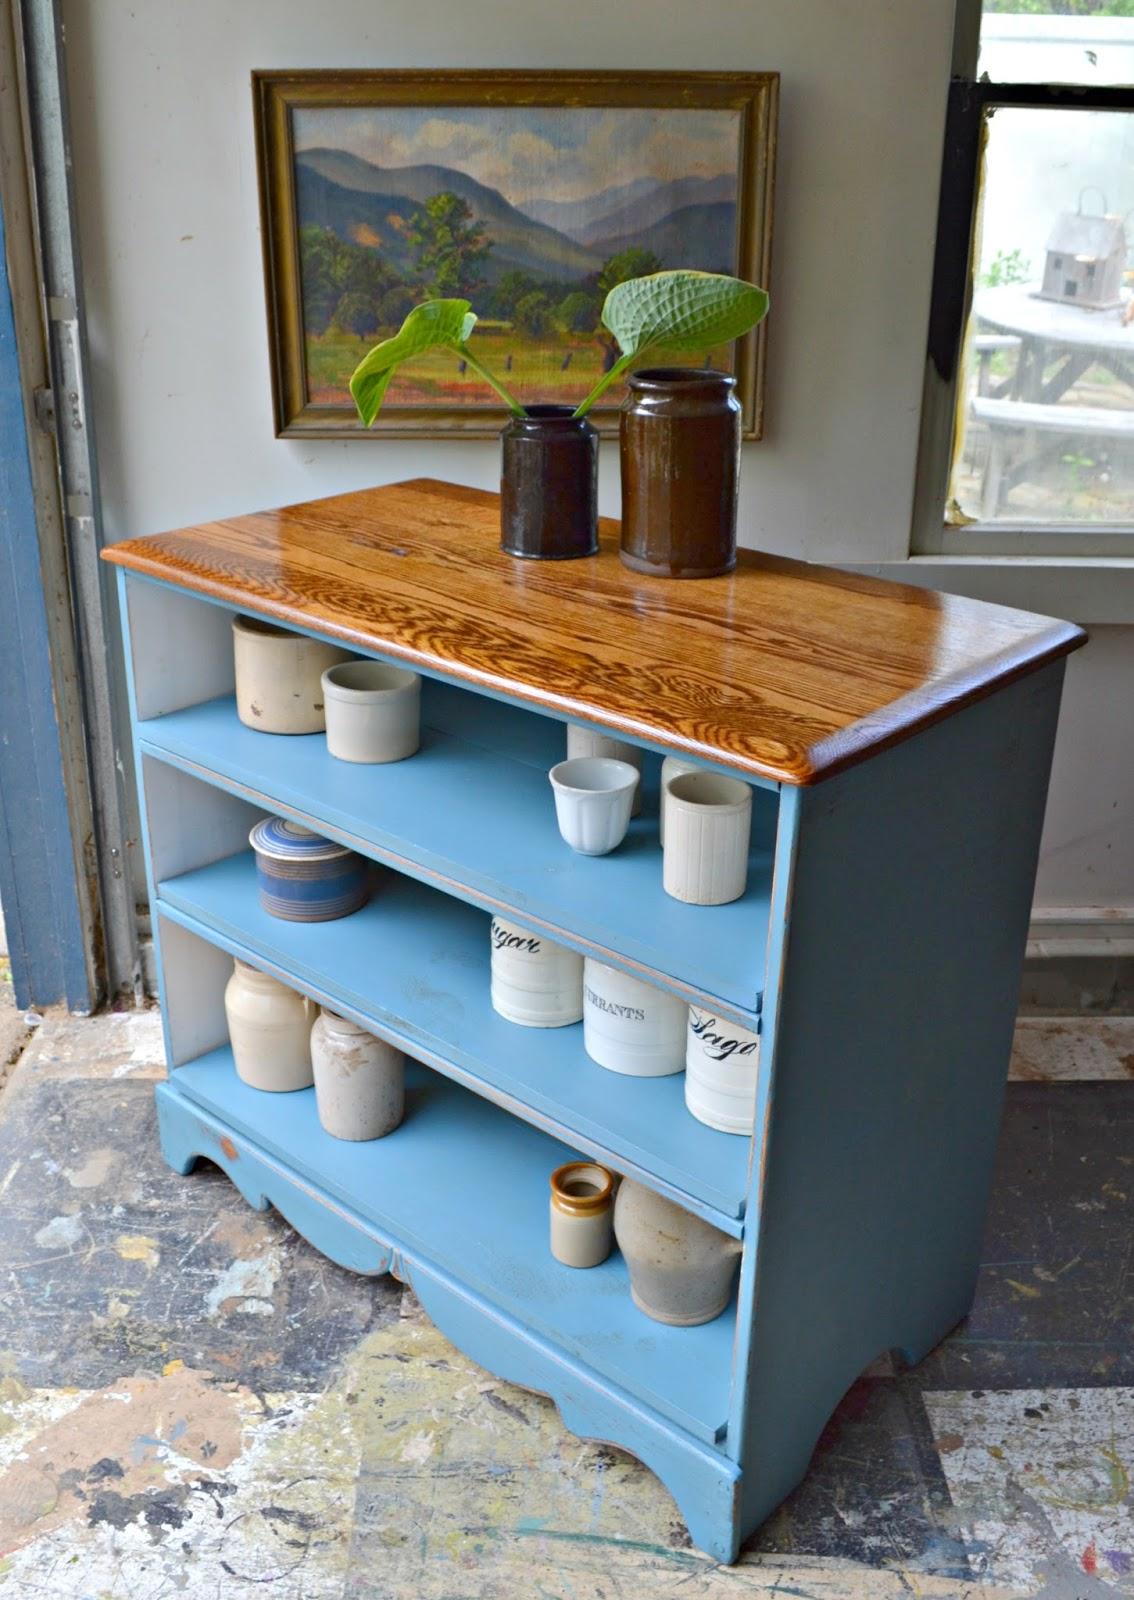 Heir and Space: An Antique Oak Dresser Turned Bookshelf